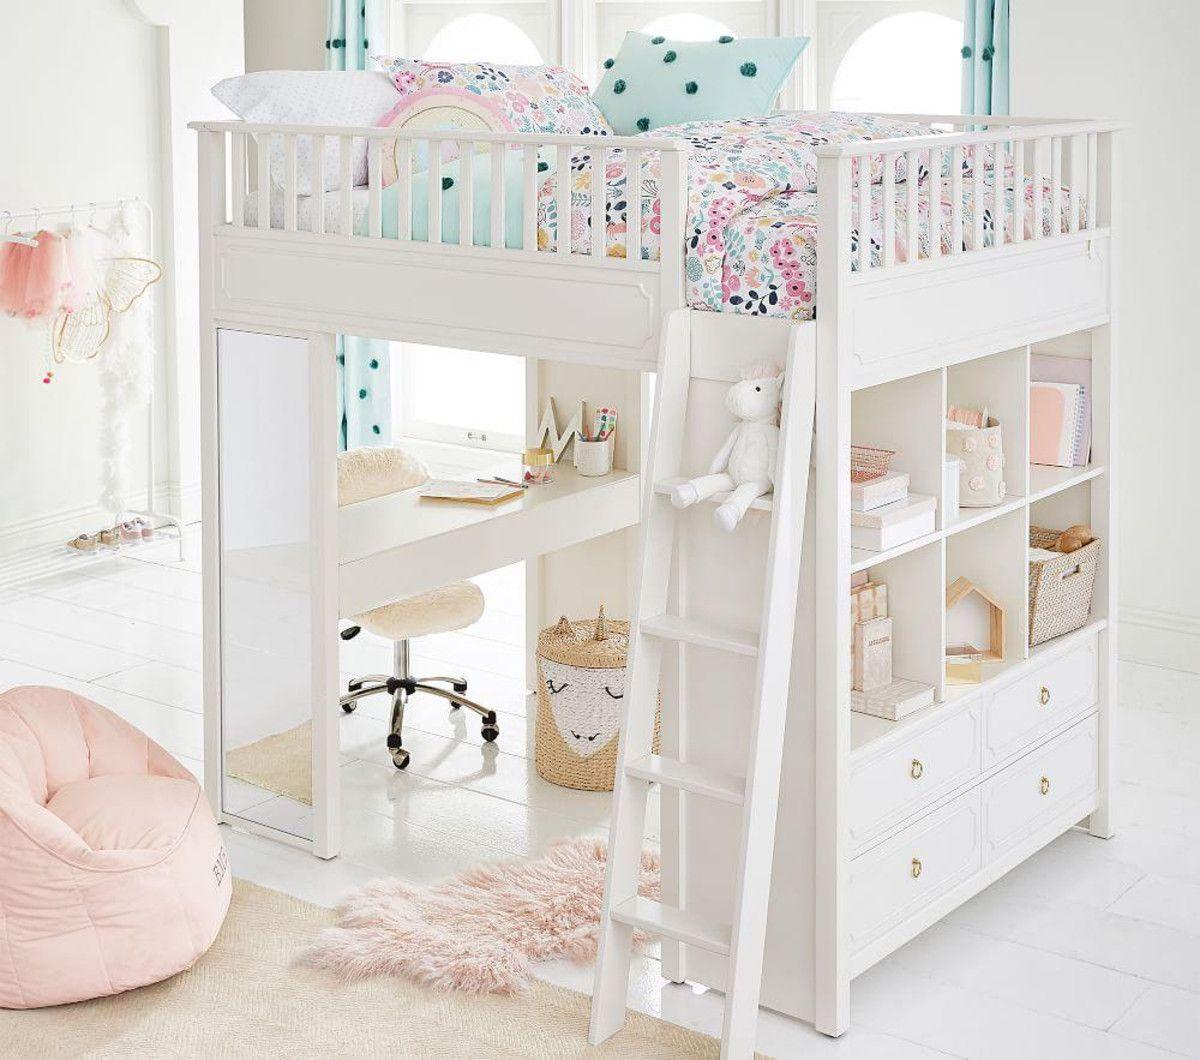 Ava Regency Loft Bed Bed For Girls Room Girls Bedroom Kid Beds